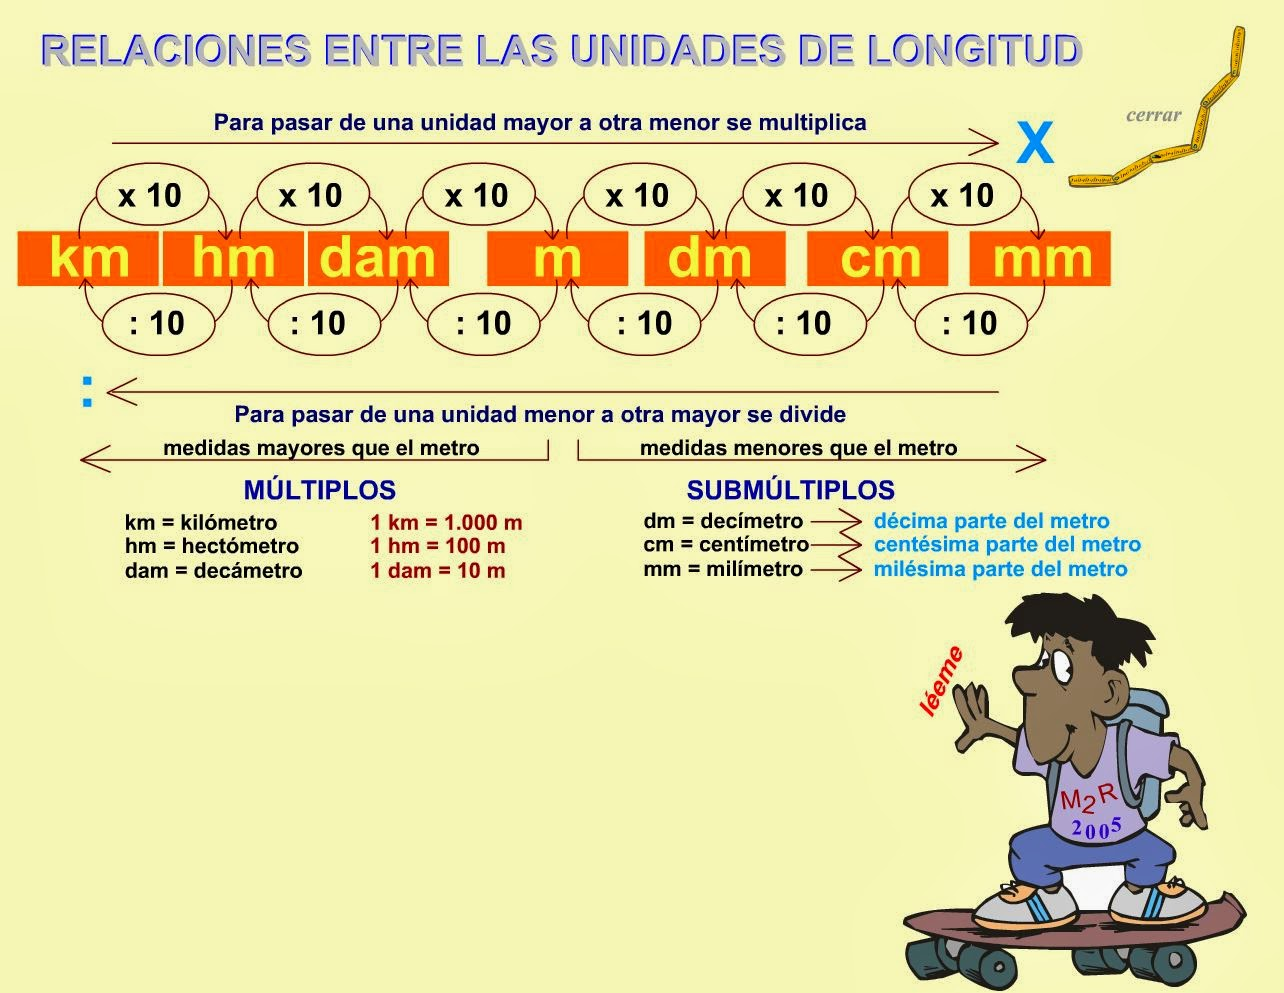 http://www.gobiernodecanarias.org/educacion/3/WebC/eltanque/todo_mate/r_medidas/longitud_p.html